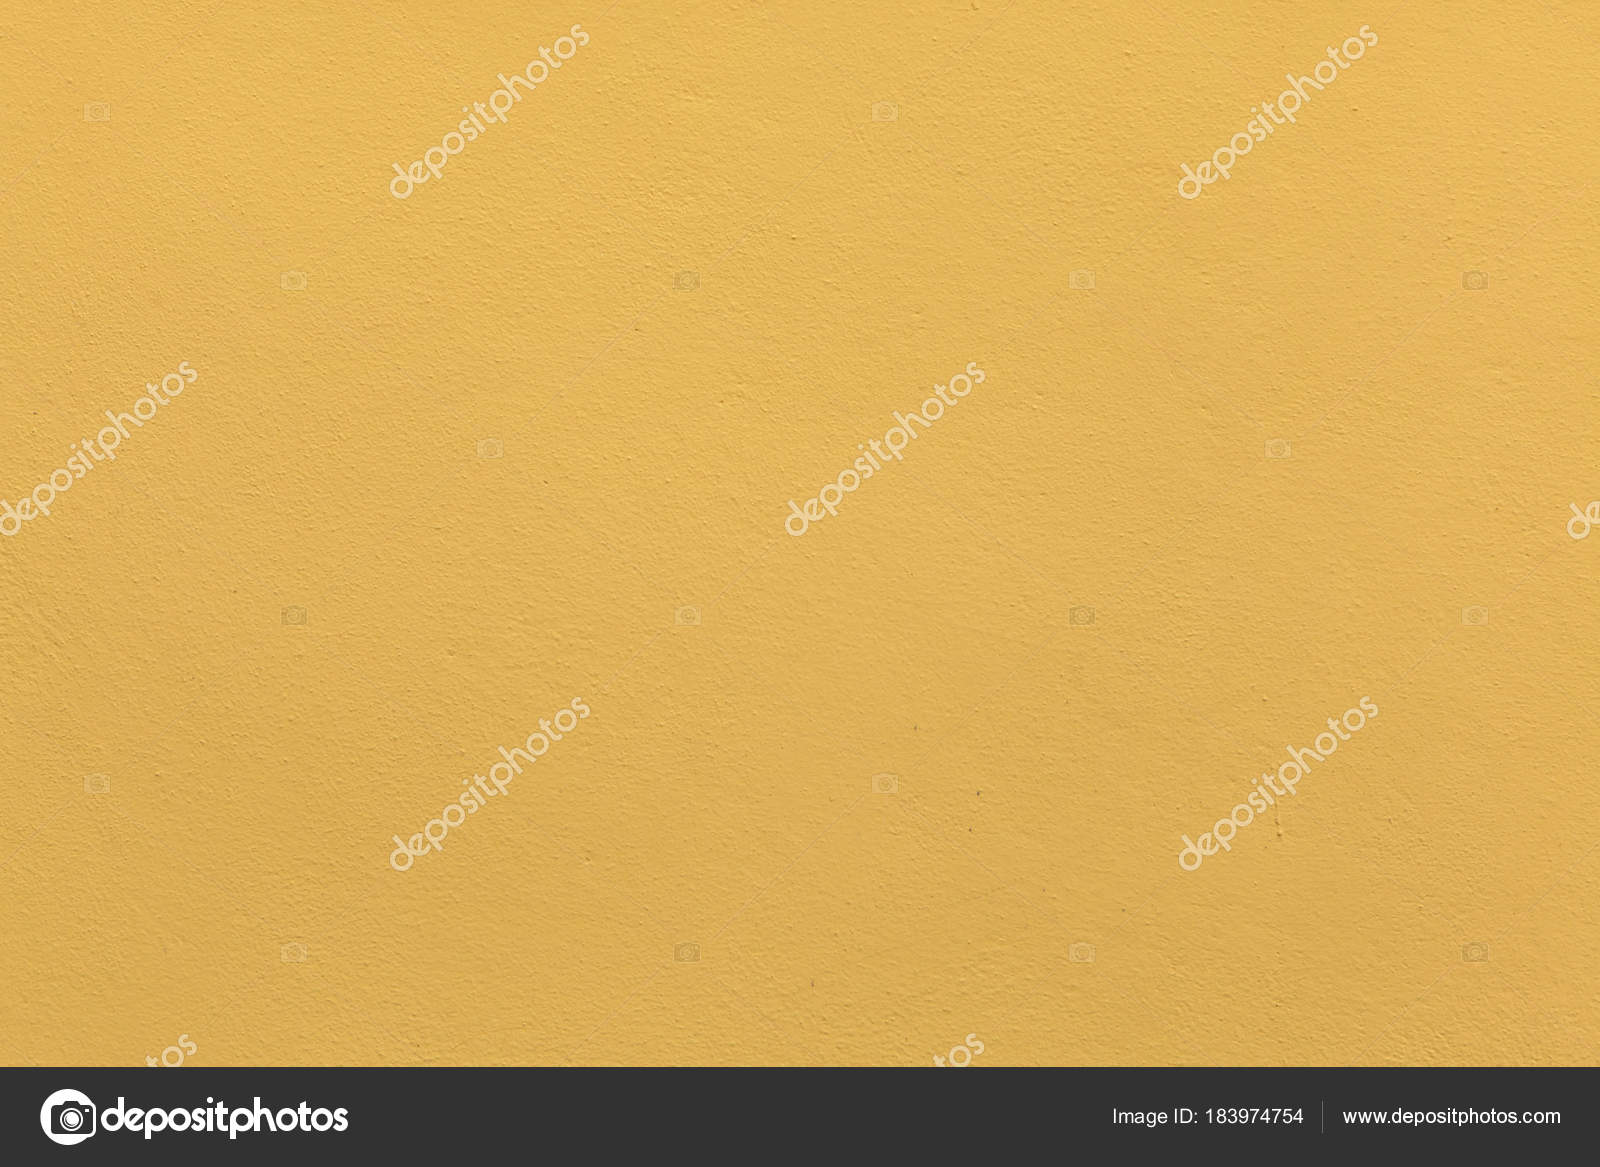 Stucco Wall Painted Yellow Ochre — Stock Photo © wrangel #183974754